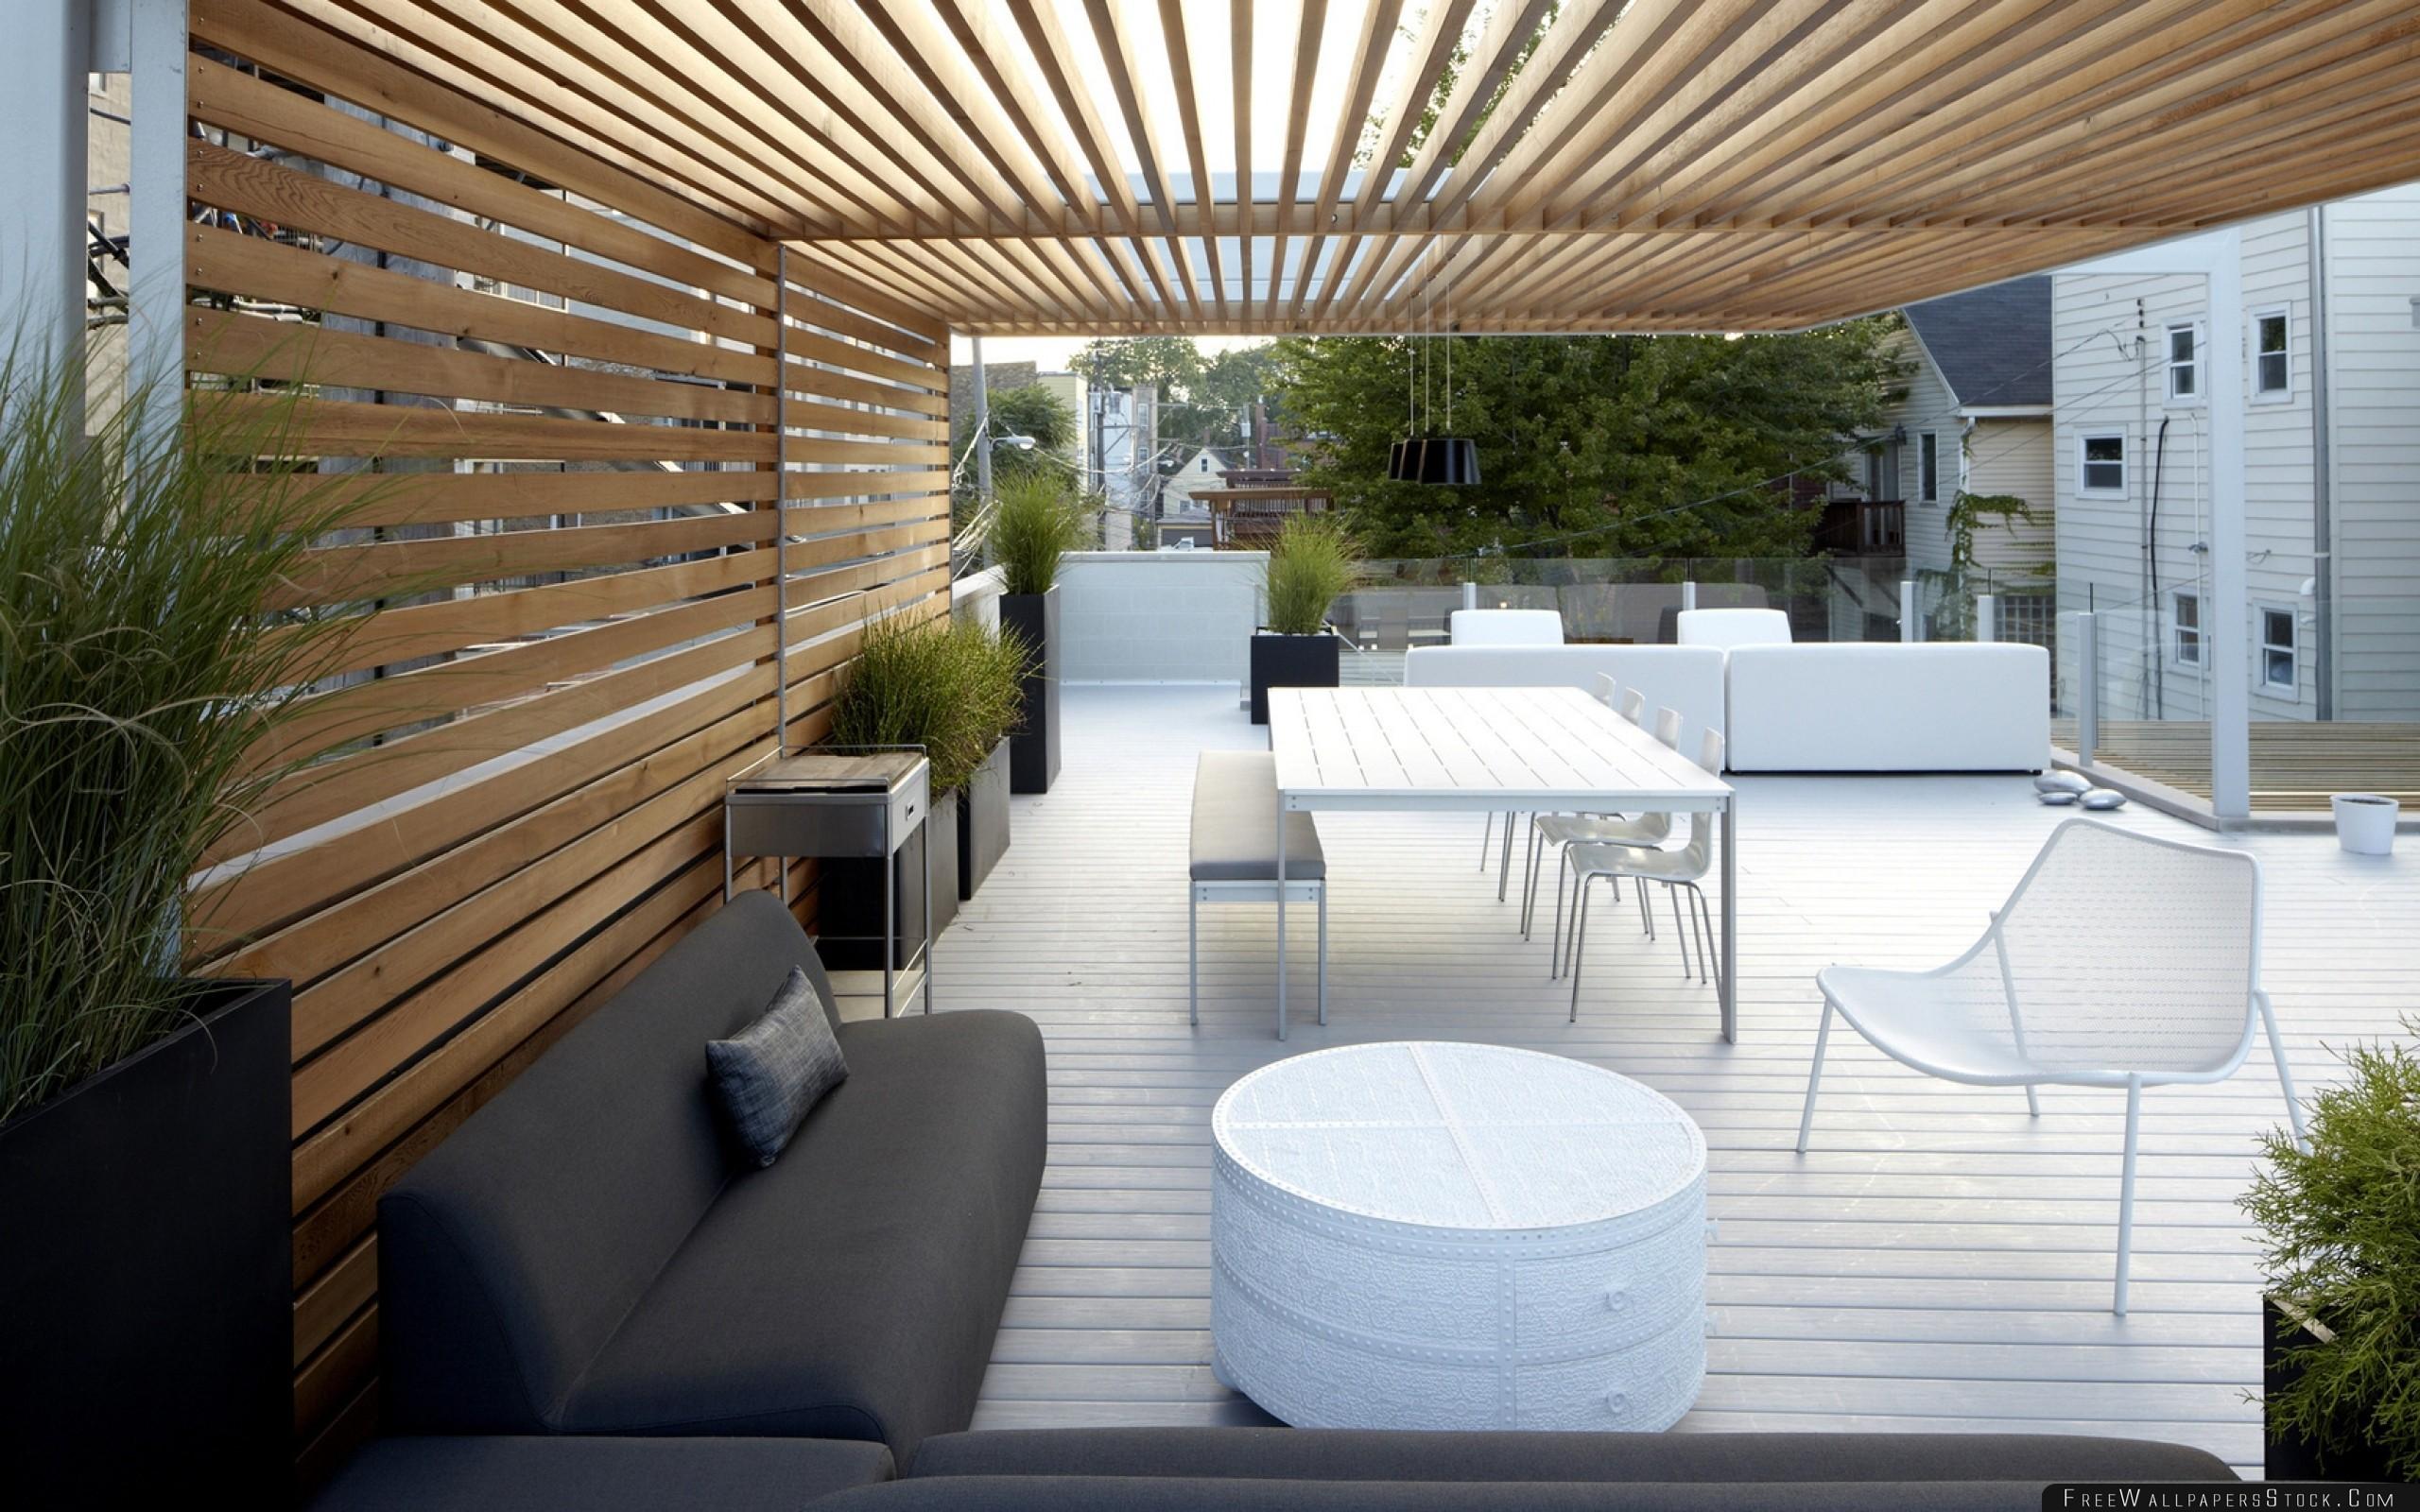 Download Free Wallpaper Patio Garden White Furniture